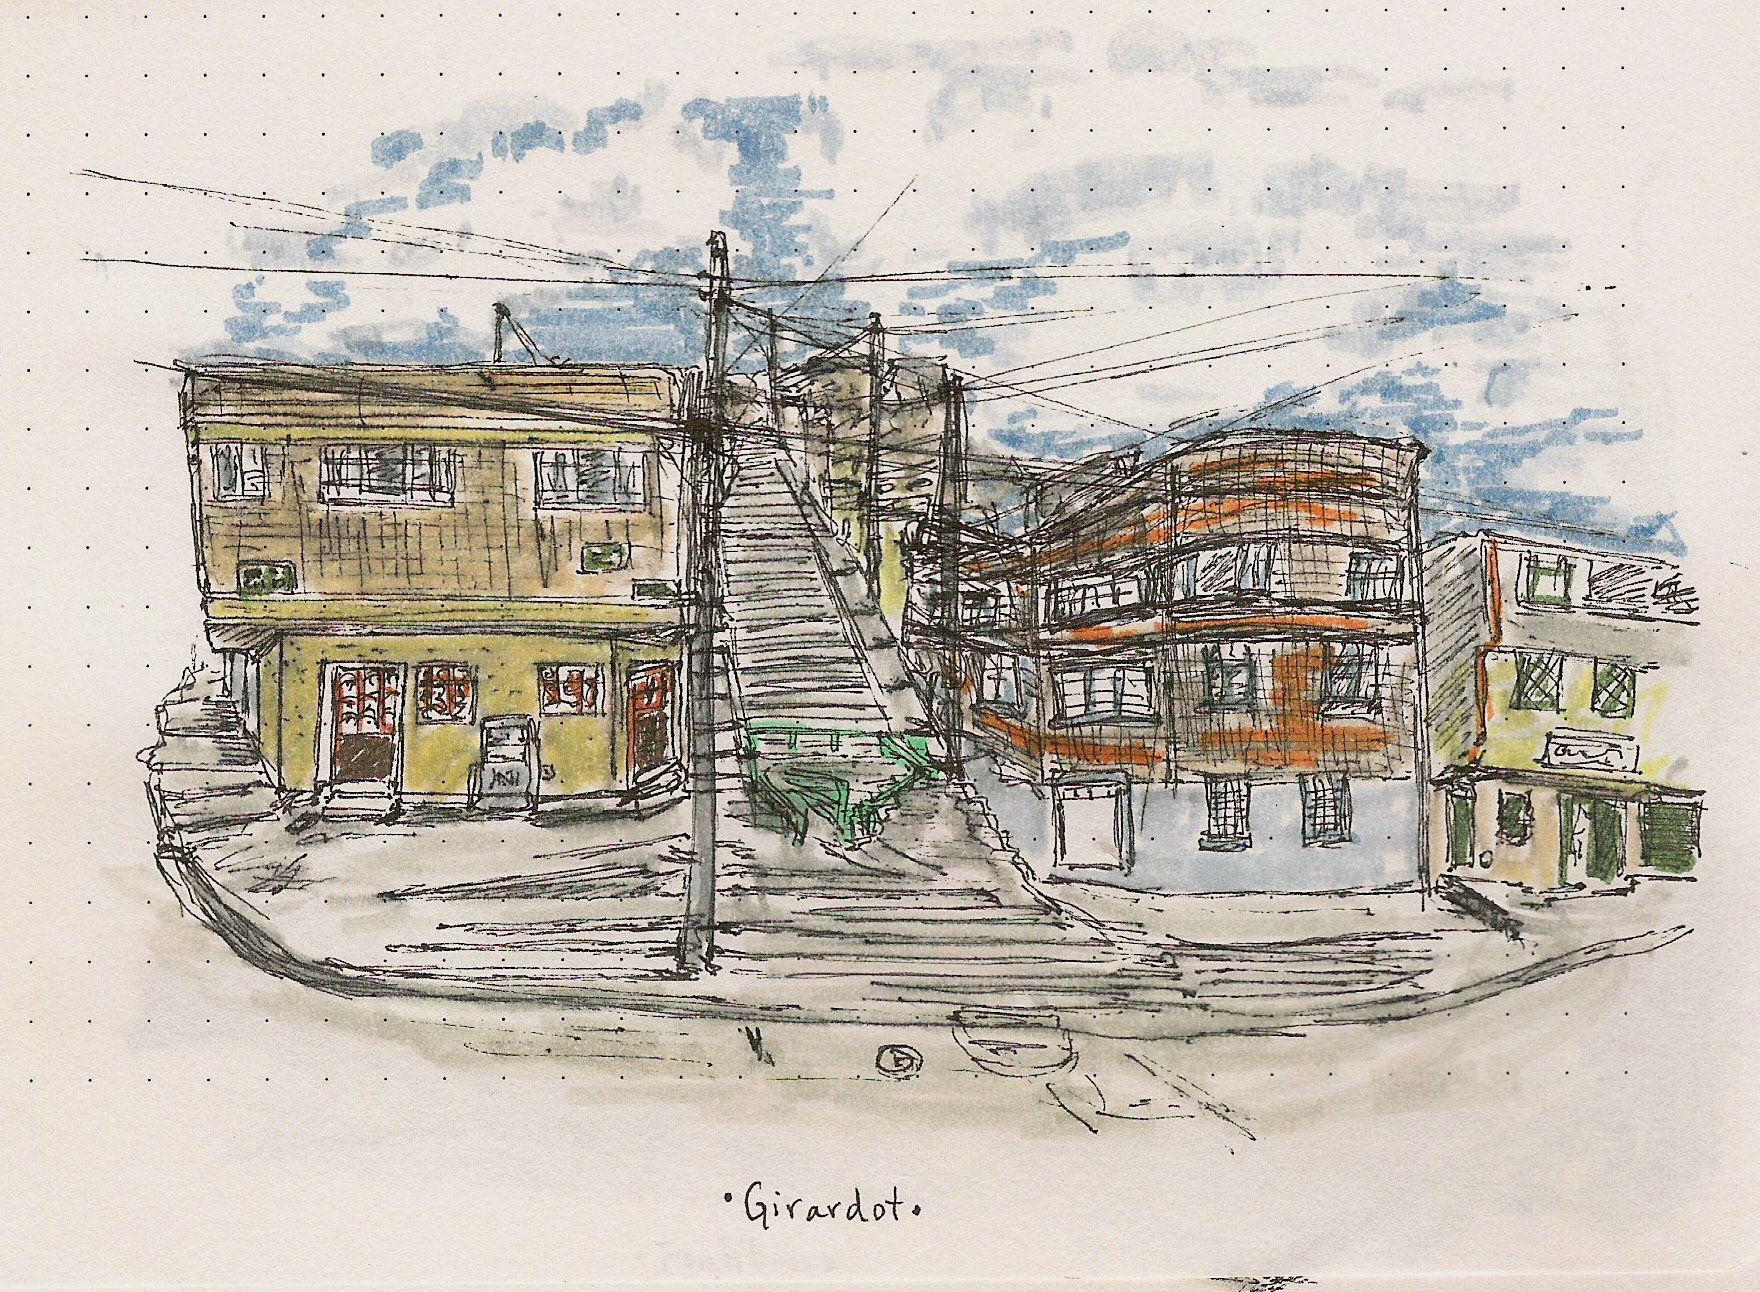 18_02-Girardot